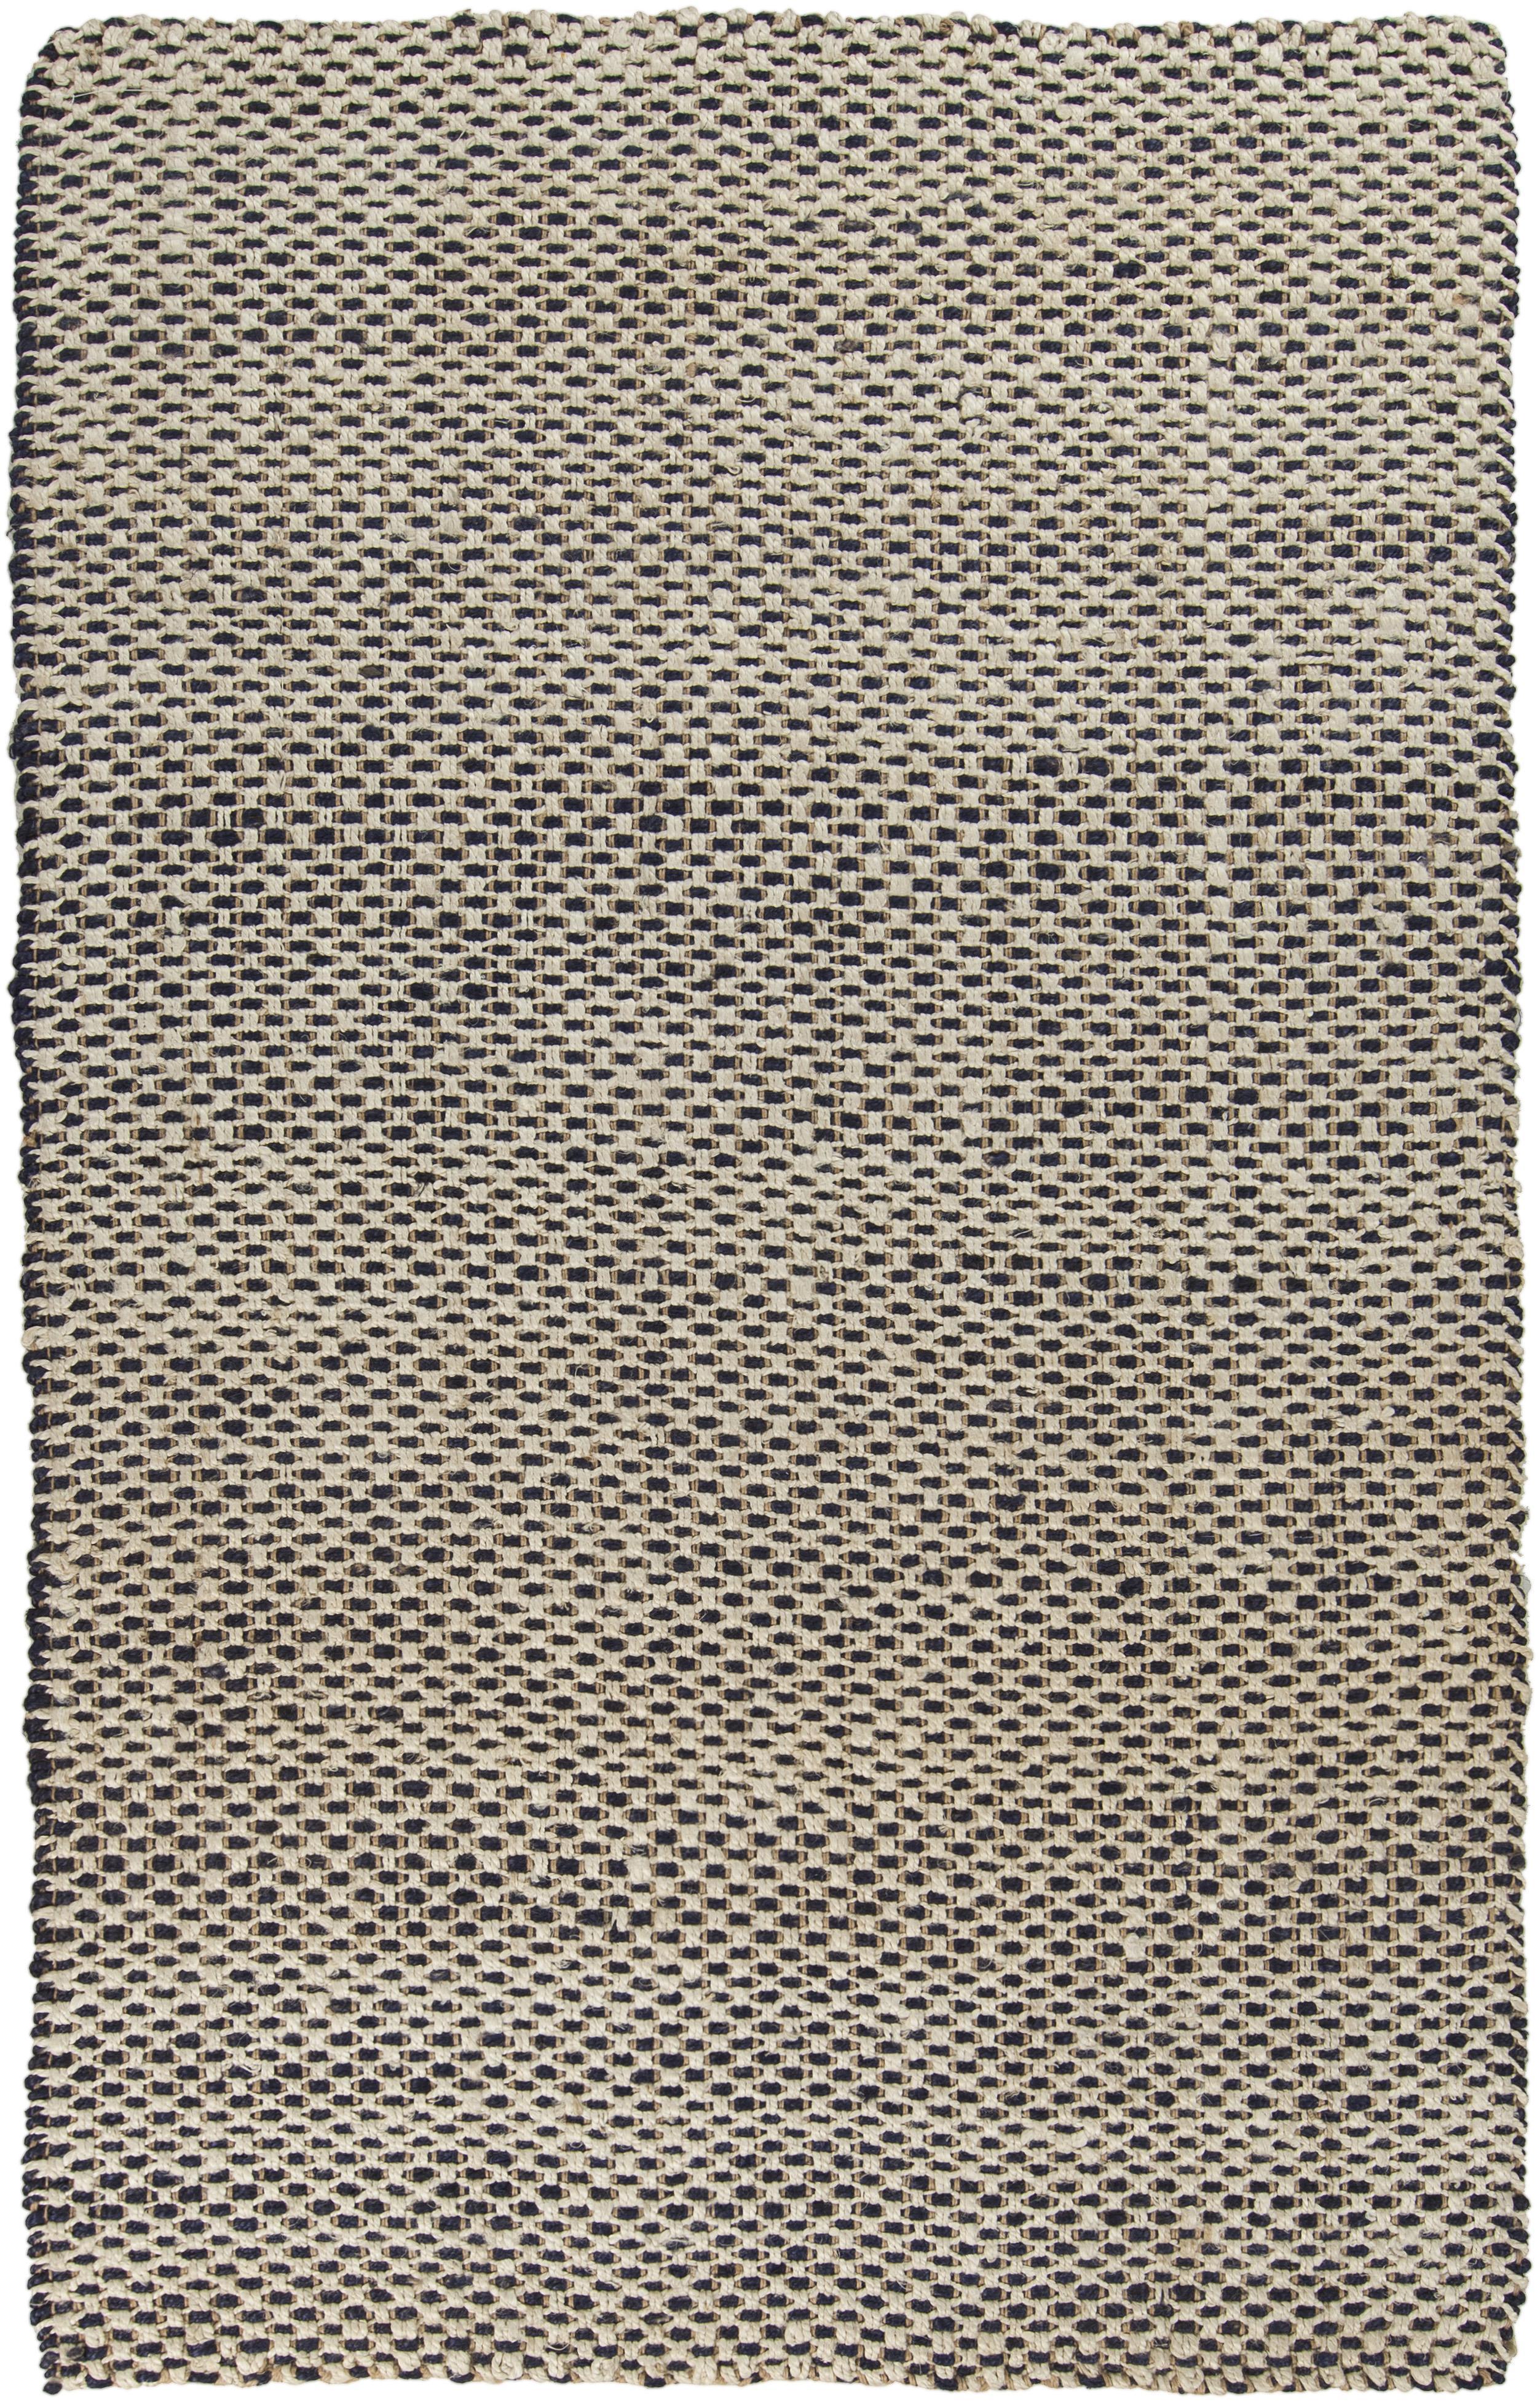 Surya Reeds 10' x 14' - Item Number: REED825-1014